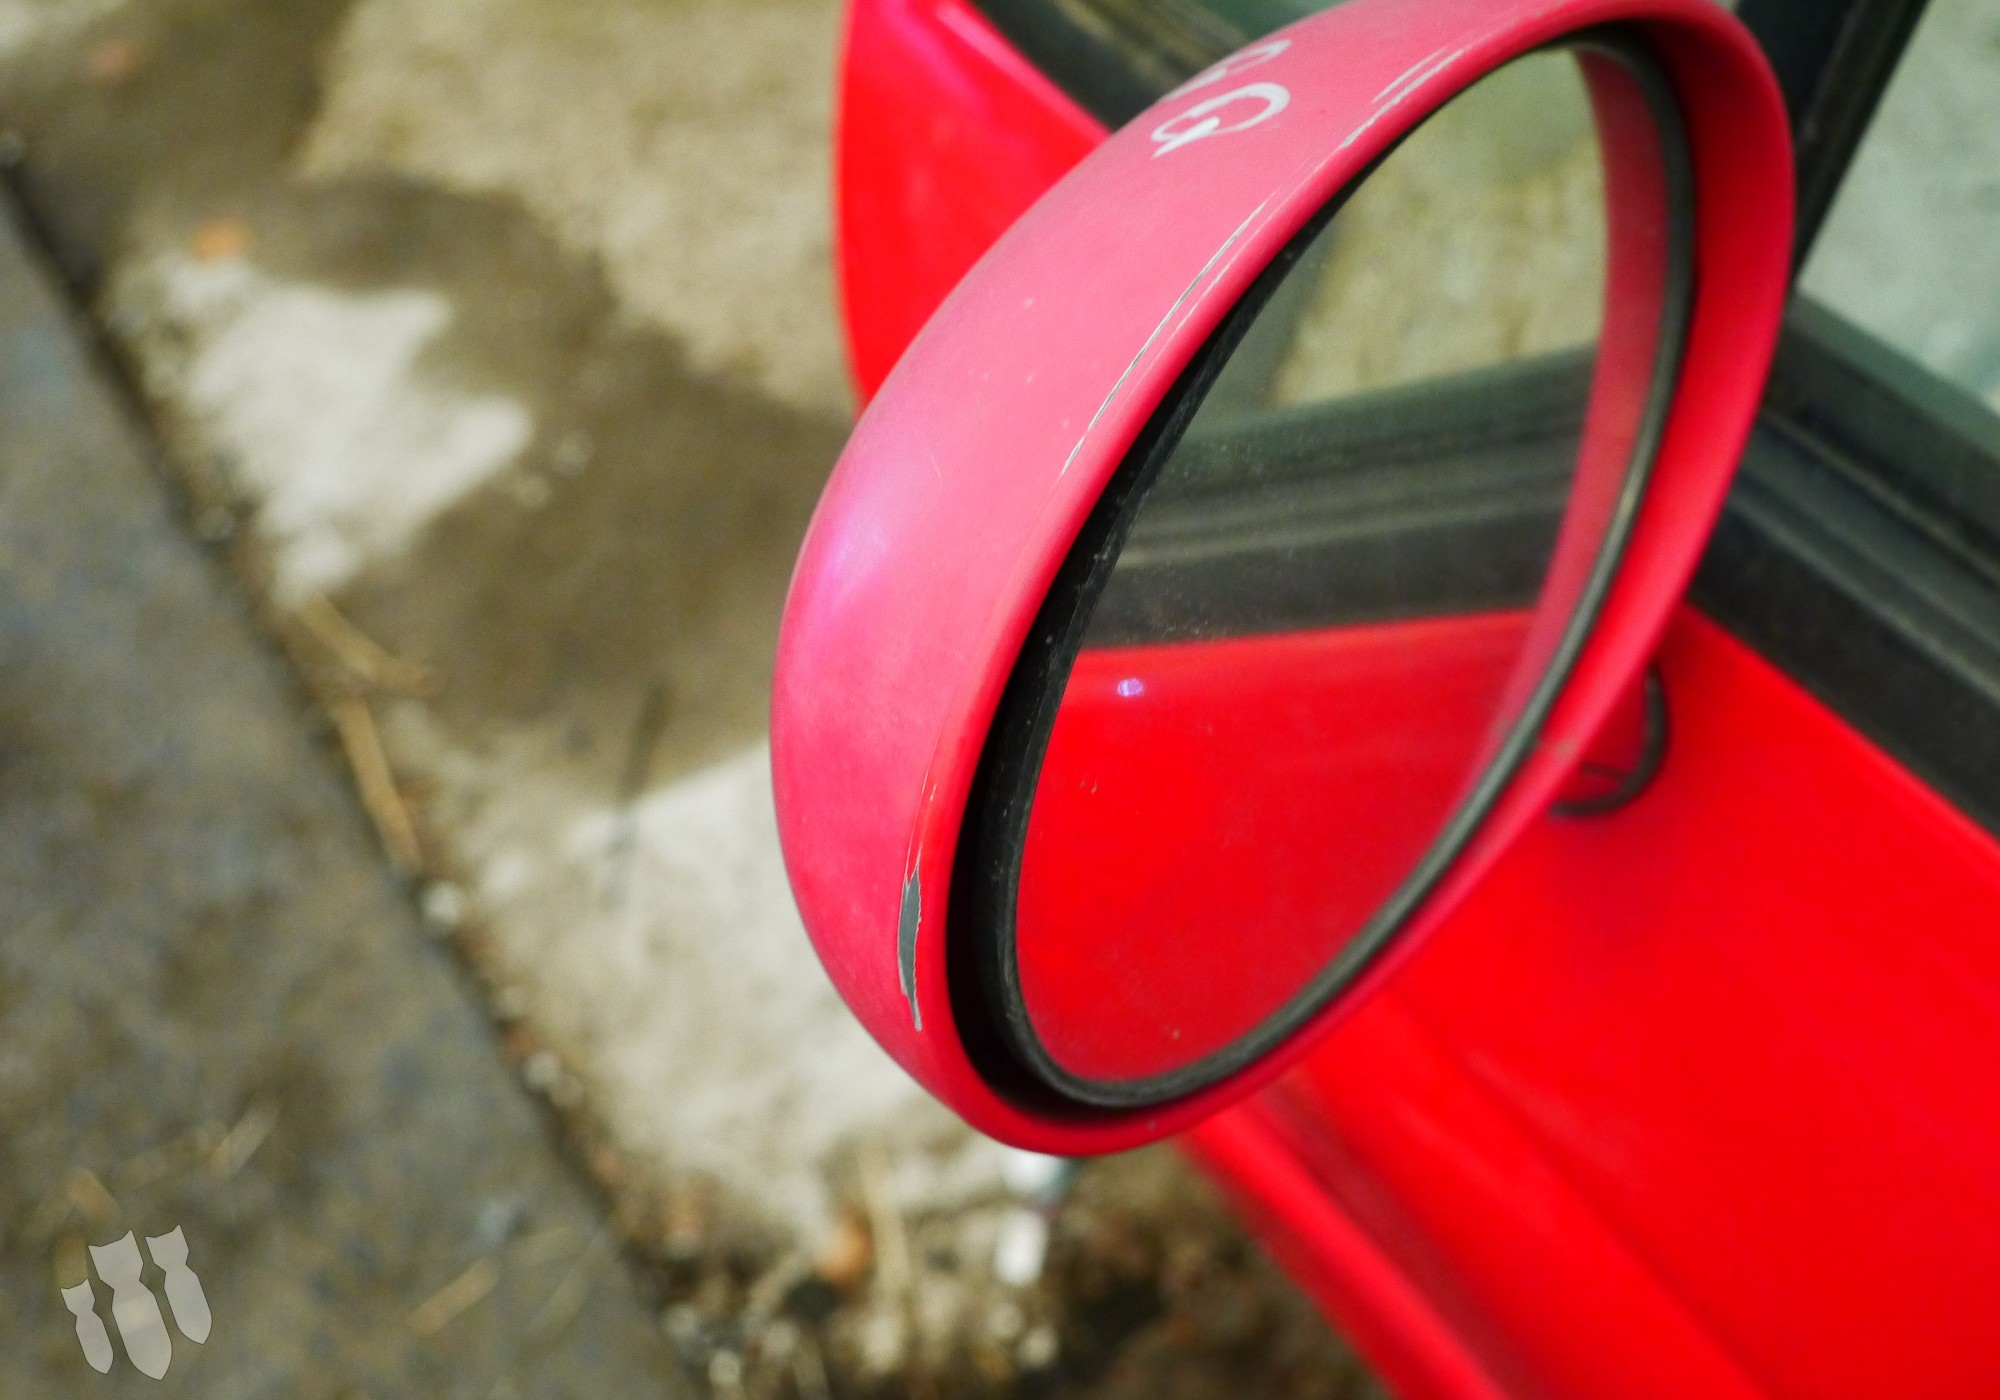 S118202010BA Зеркало заднего вида боковое левое для Chery Sweet / QQ / QQ3 (с 2003)